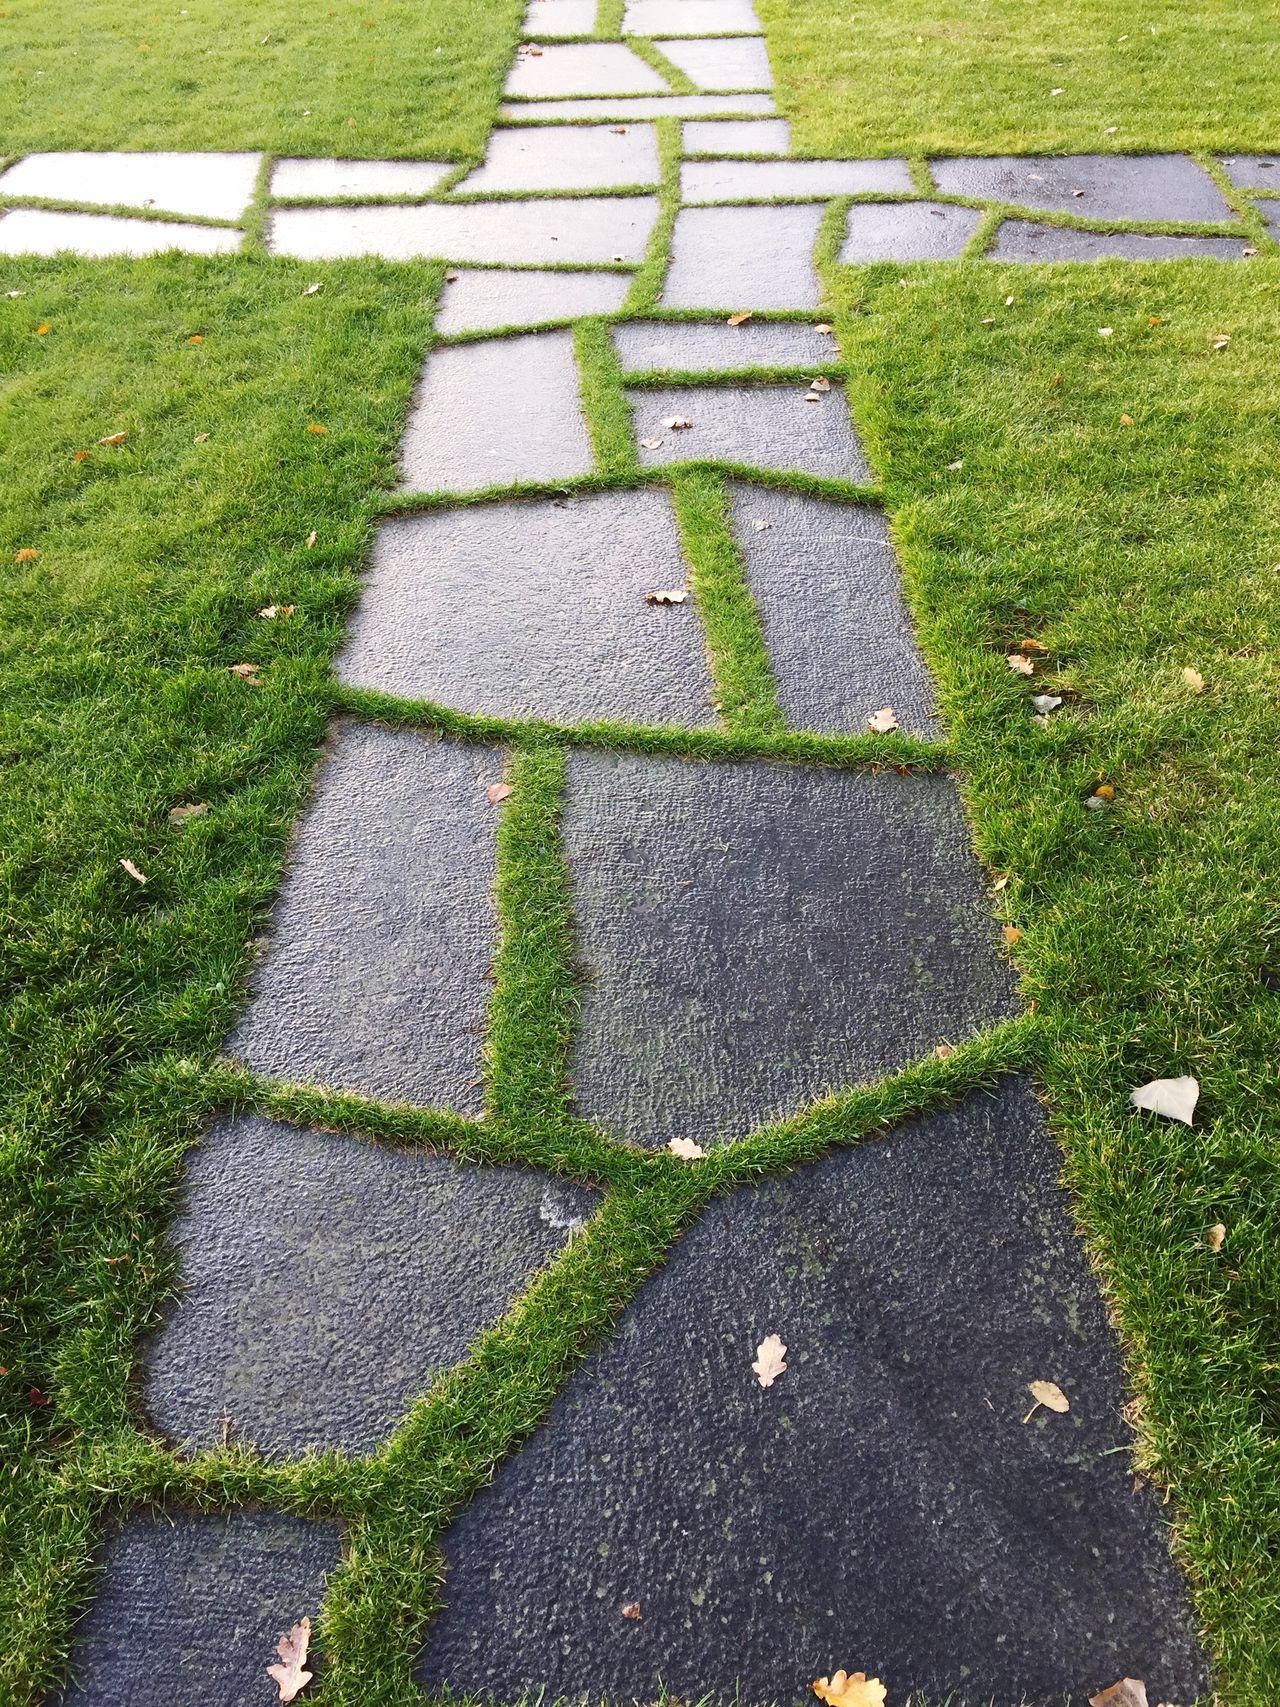 Cross Crossing Grass Grassy Religious Art Crossroads Grass Nature No People Path Pathway Pathways Walk Stone Way Walkway Grassy Path Christianity Jesus Jesus Christ Symbol Christ Christian Symbol Jesus Is My Savior